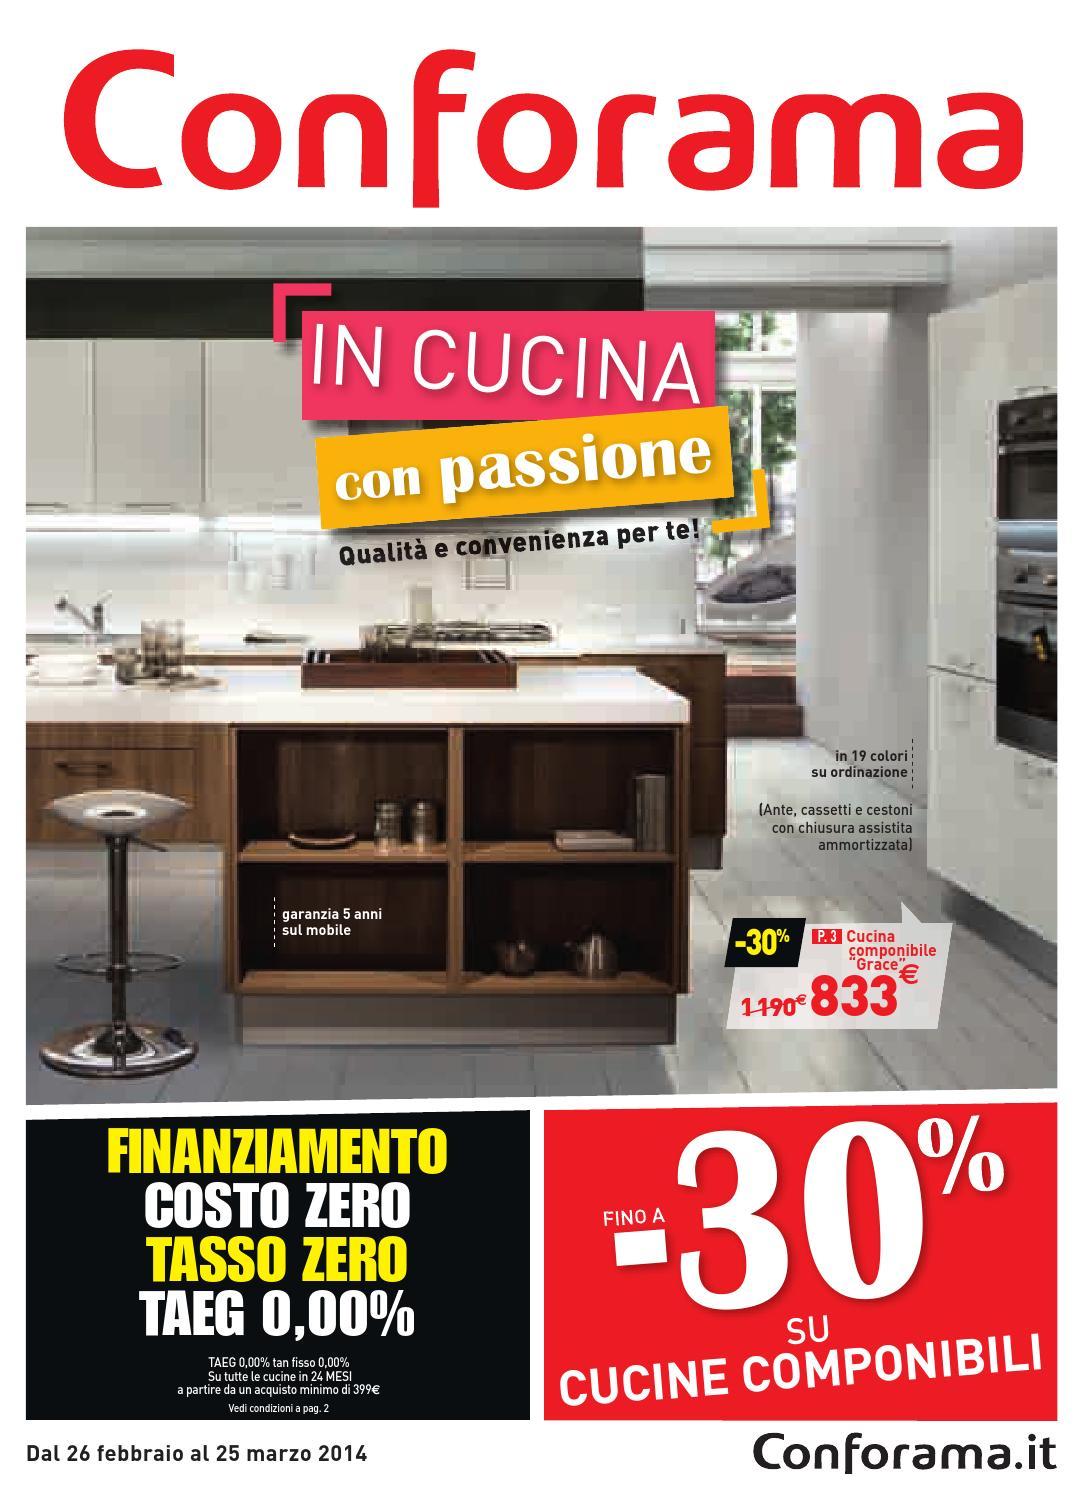 Conforama cucina che passione by Mobilpro  issuu